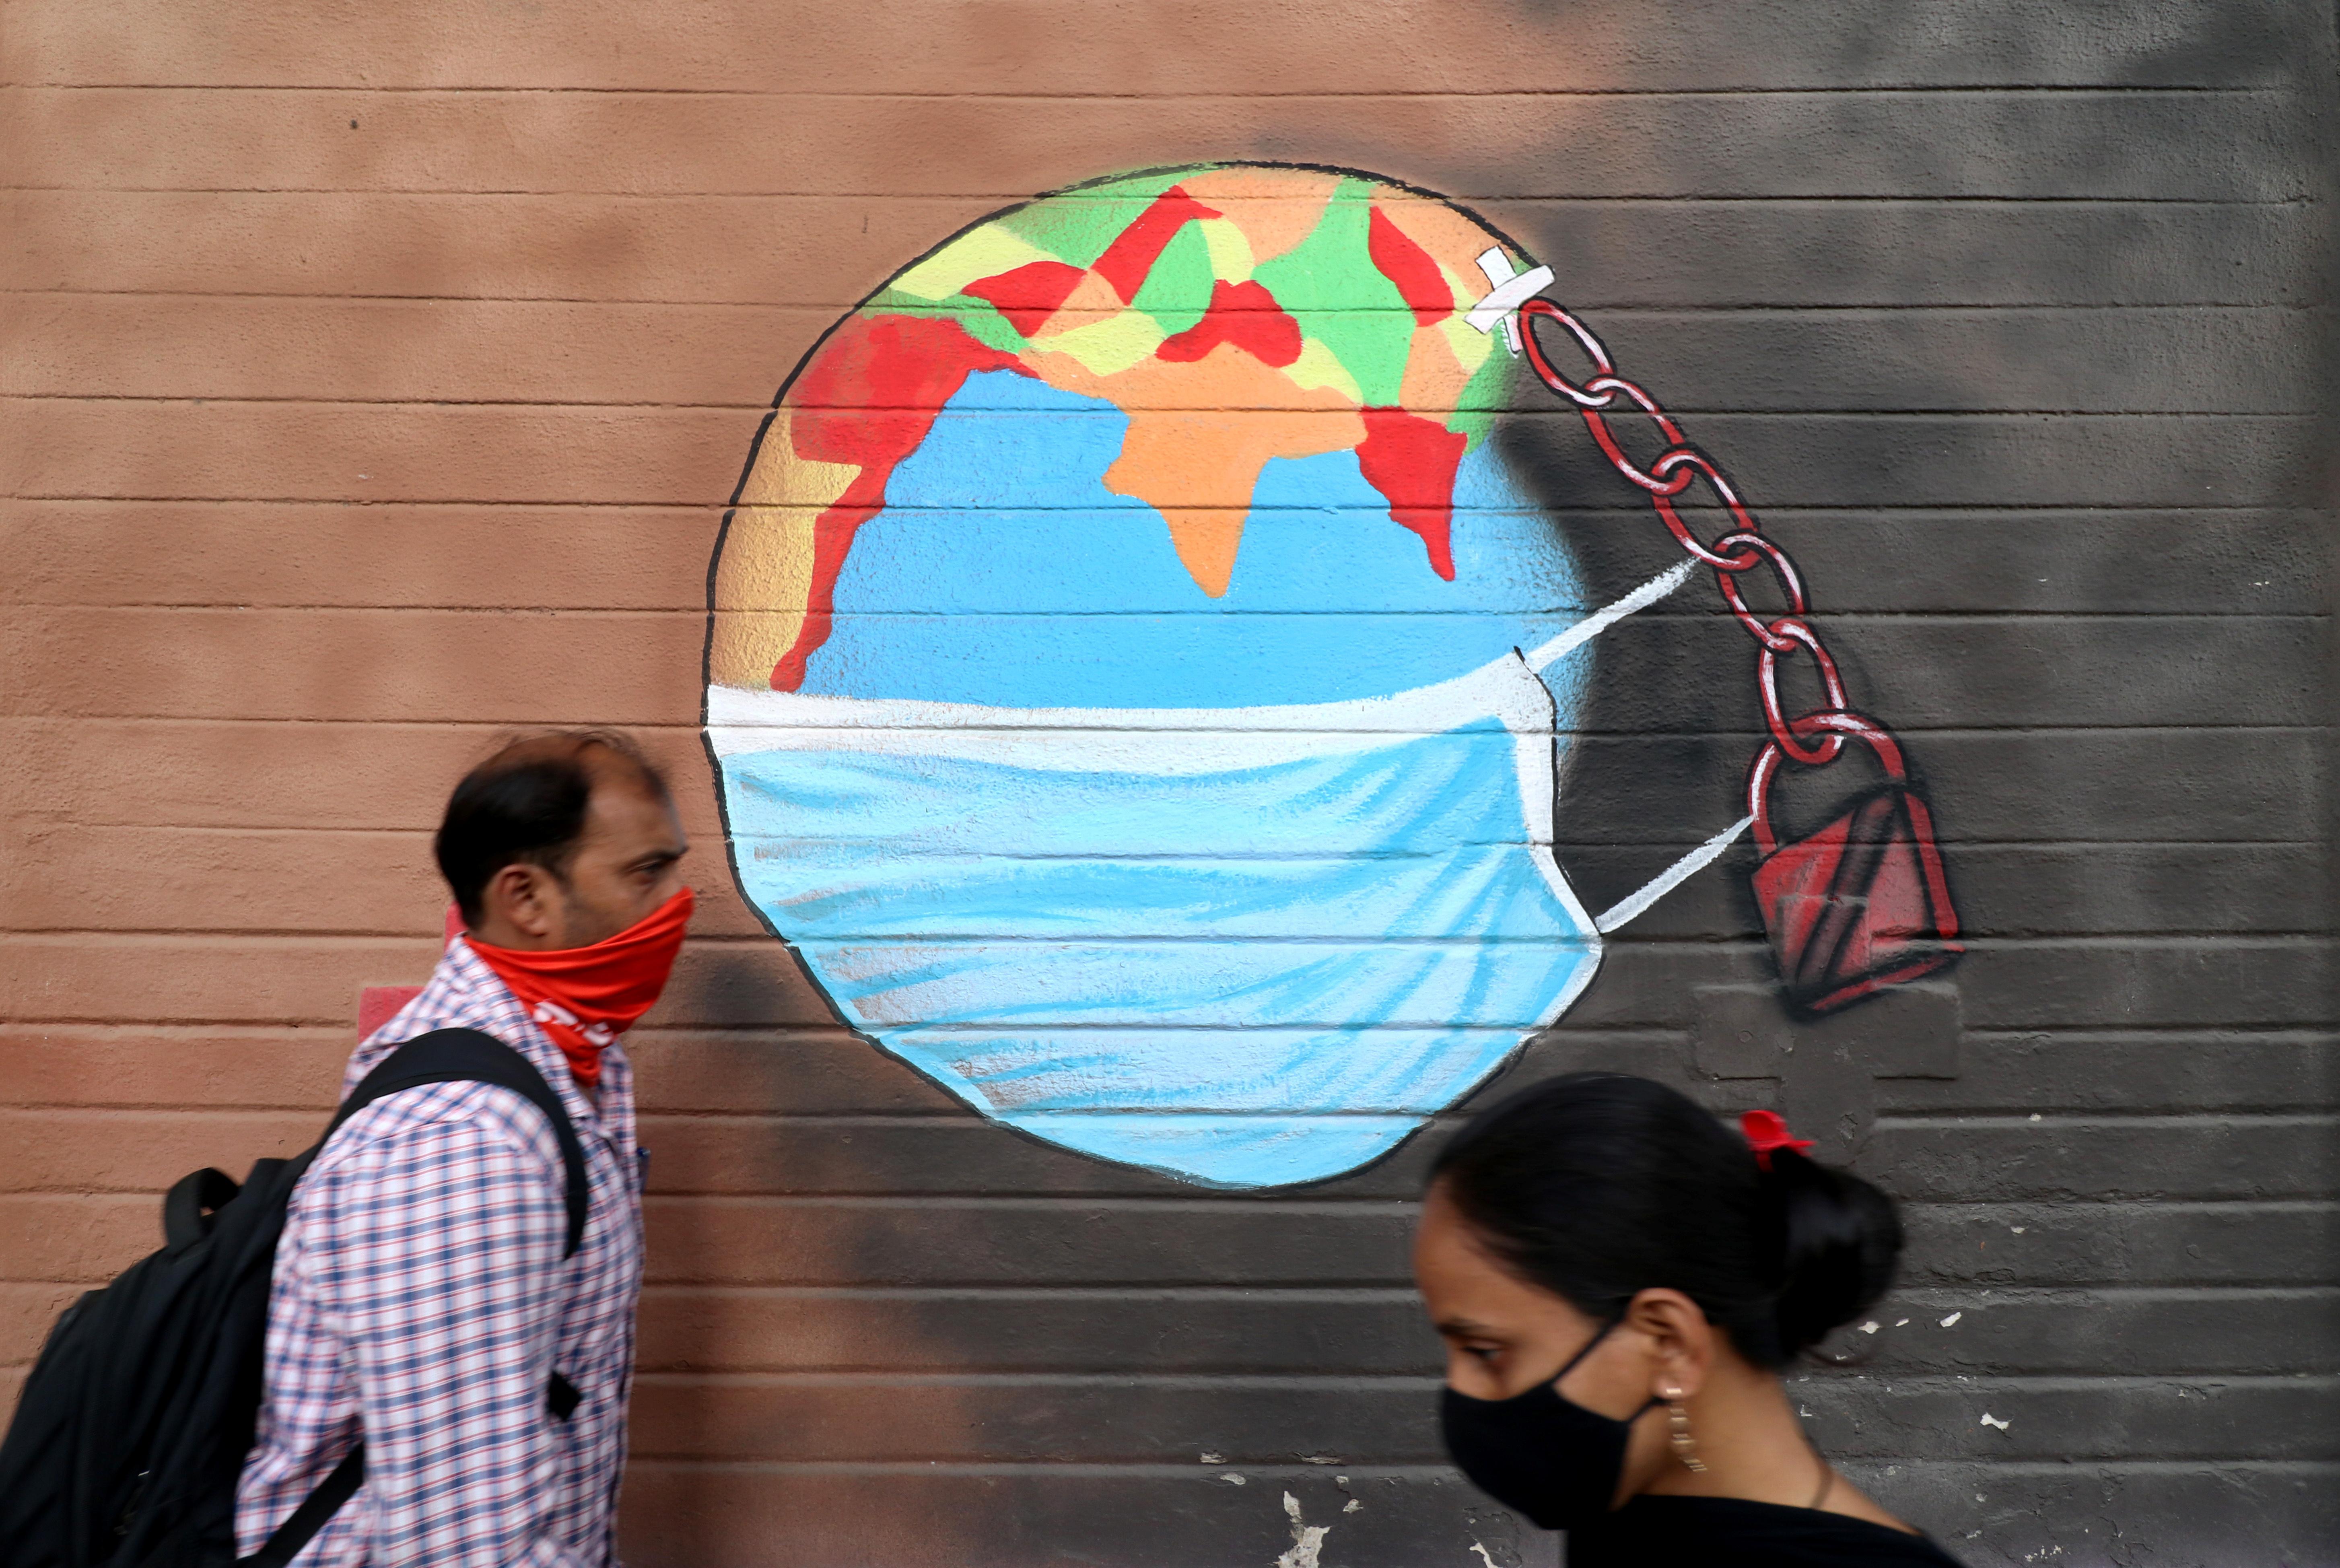 A man and a woman wearing protective face masks walk past a graffiti on a wall, amidst the spread of the coronavirus disease (COVID-19), in Mumbai, India, March 25, 2021. REUTERS/Niharika Kulkarni/File photo